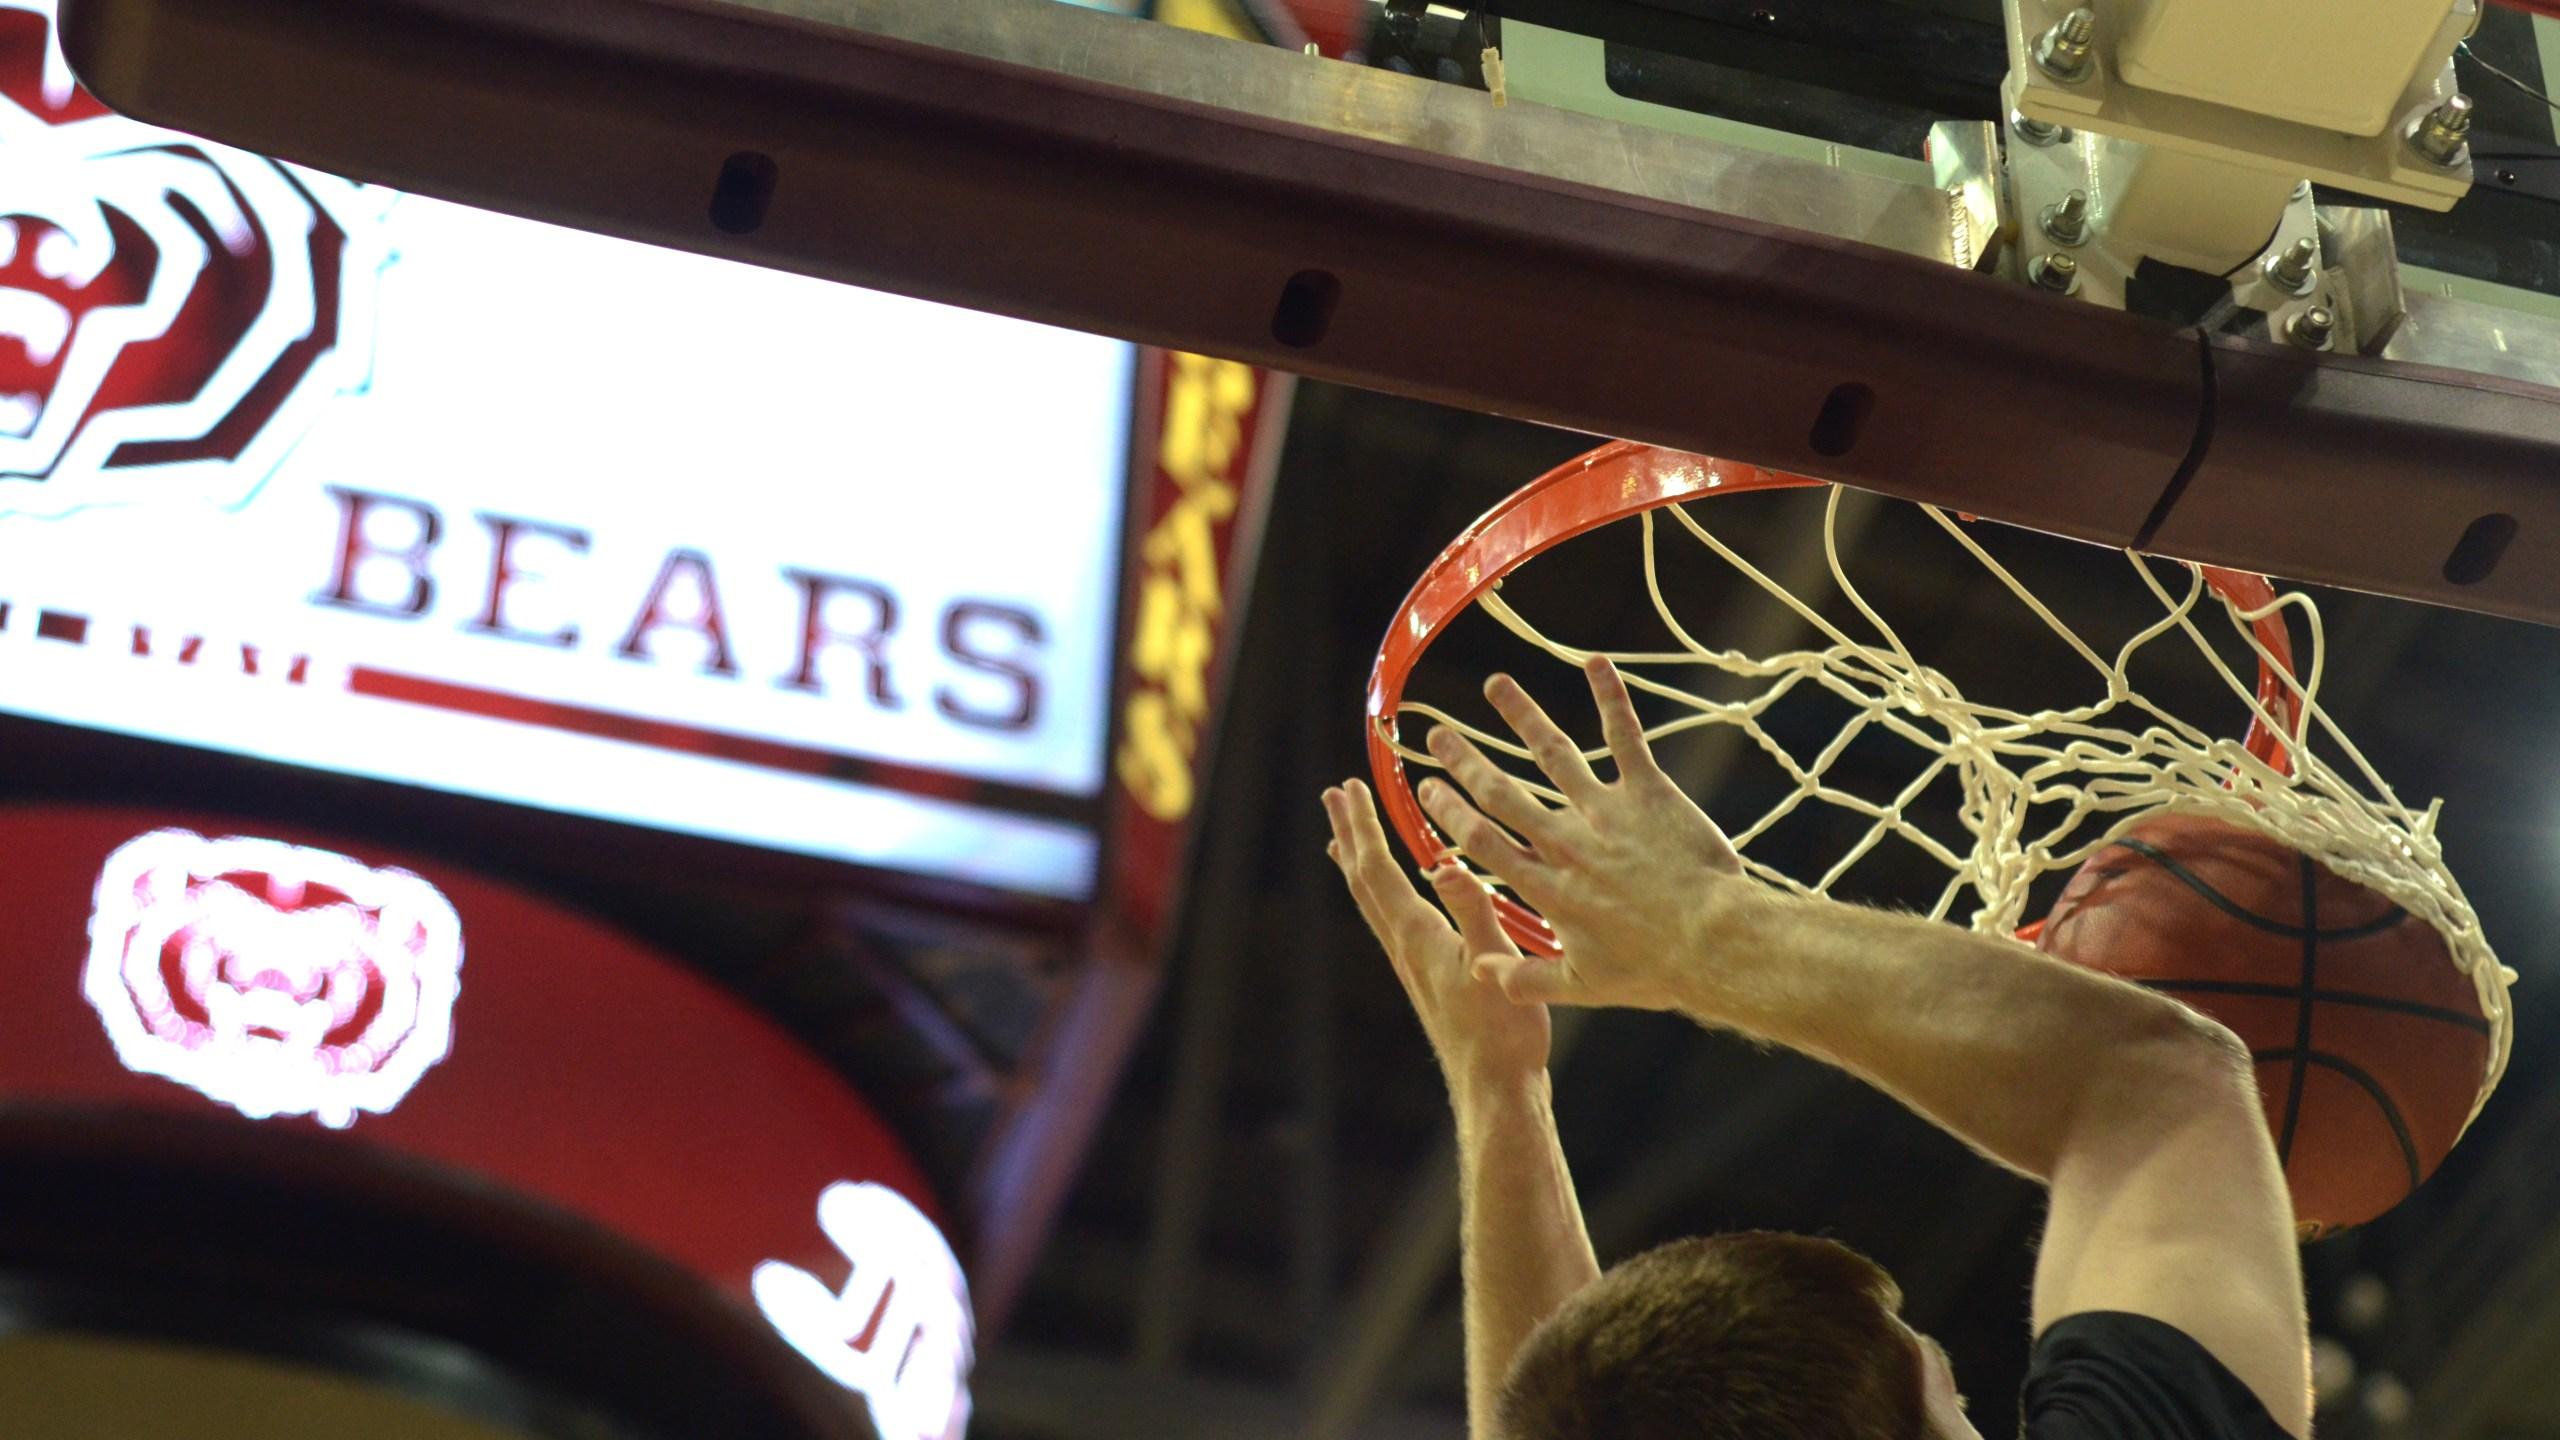 msu bears basketball